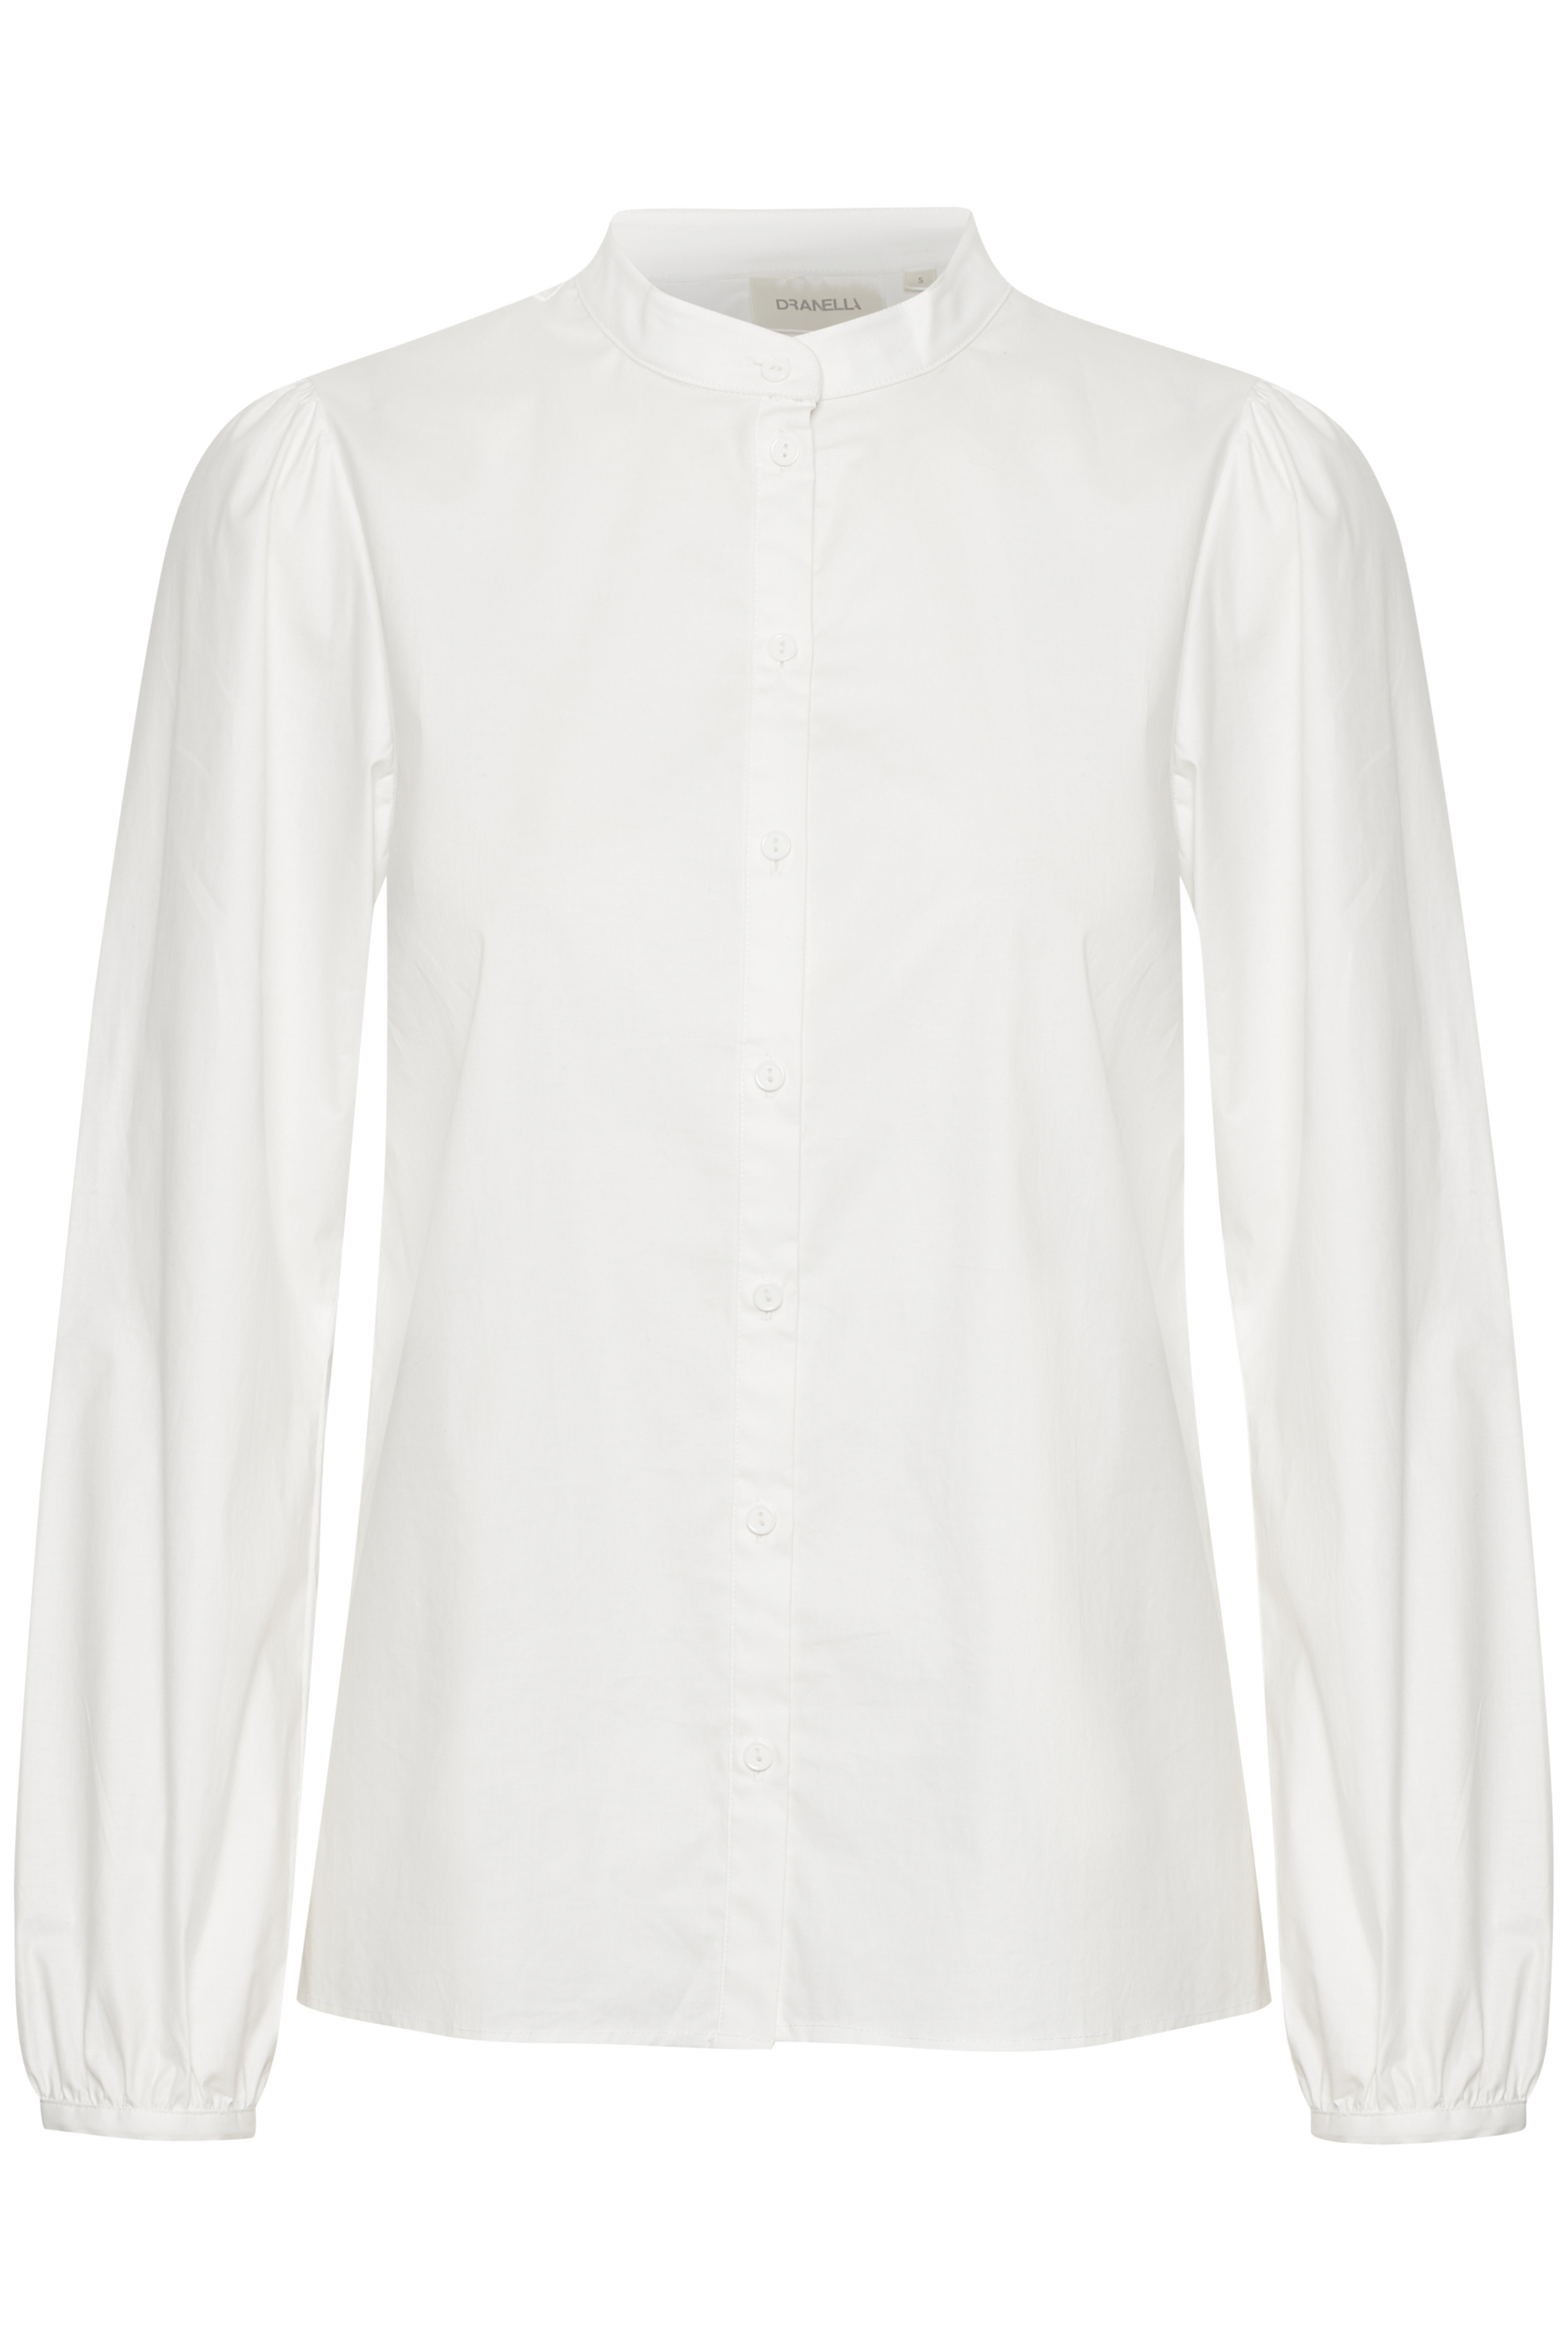 Image of Dranella Dame Skjorte - Hvid